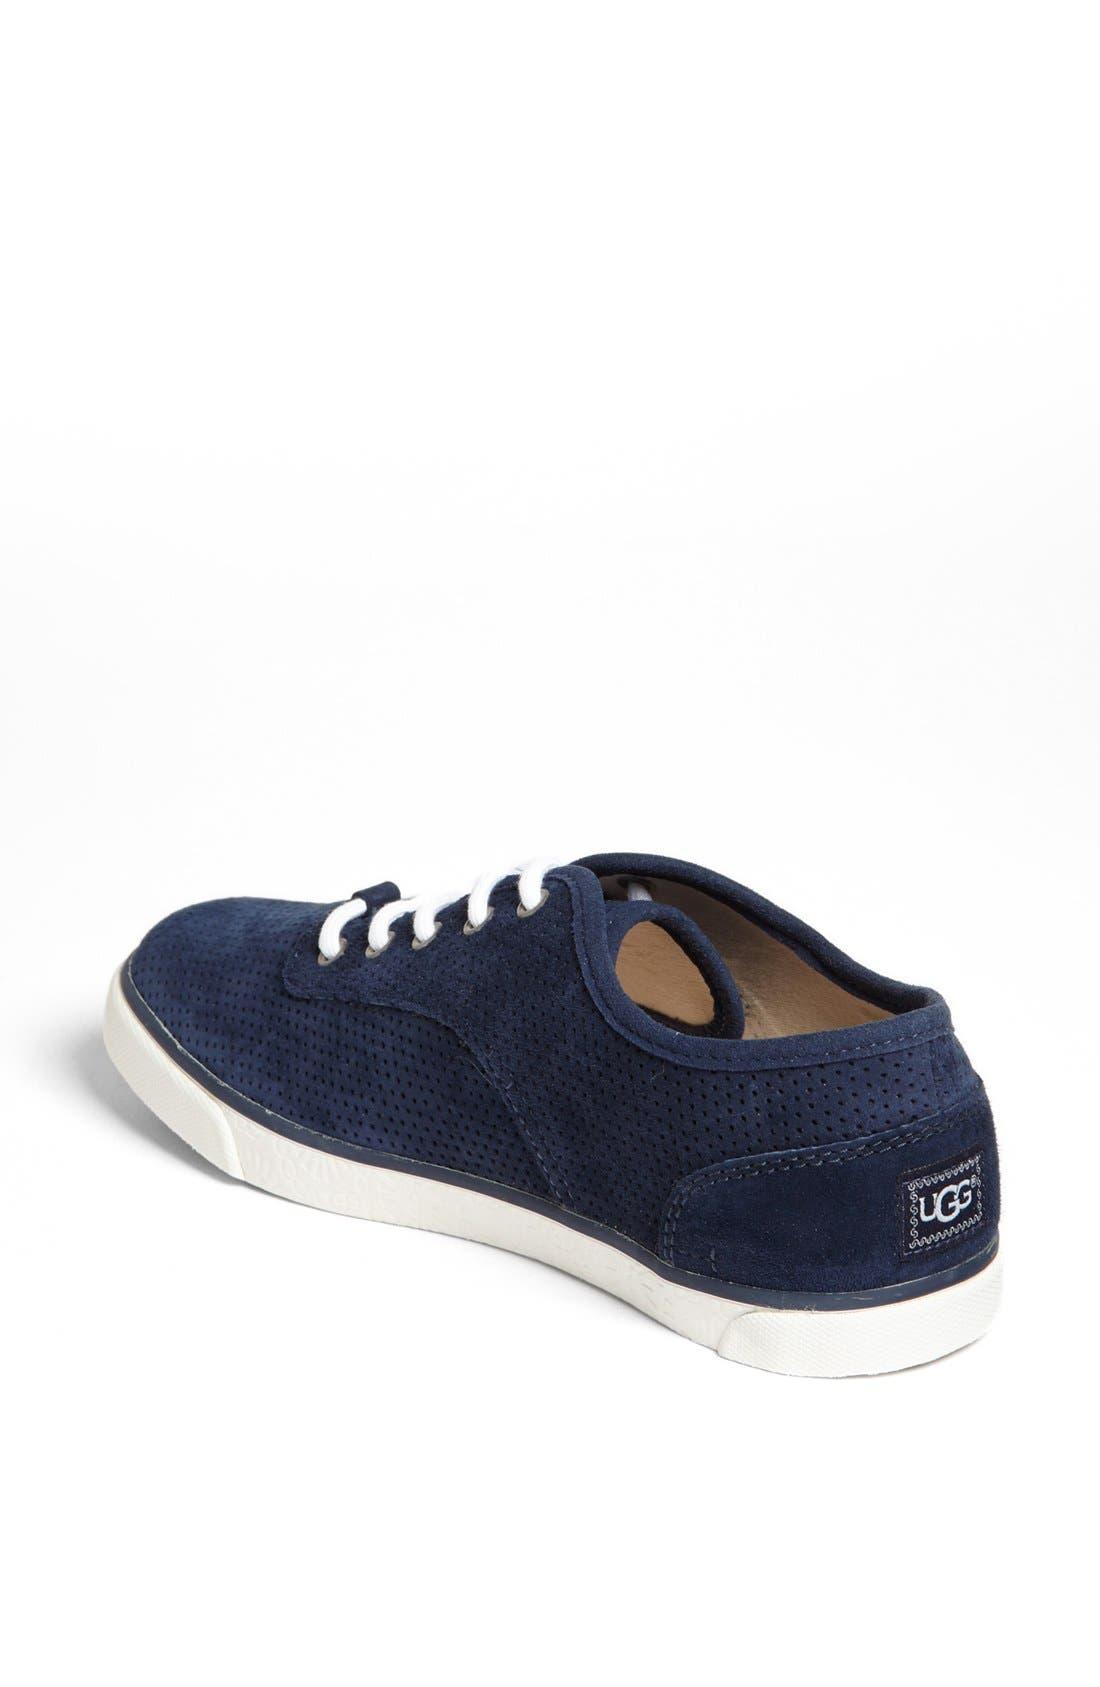 Alternate Image 2  - UGG® Australia 'Hally' Perforated Suede Sneaker